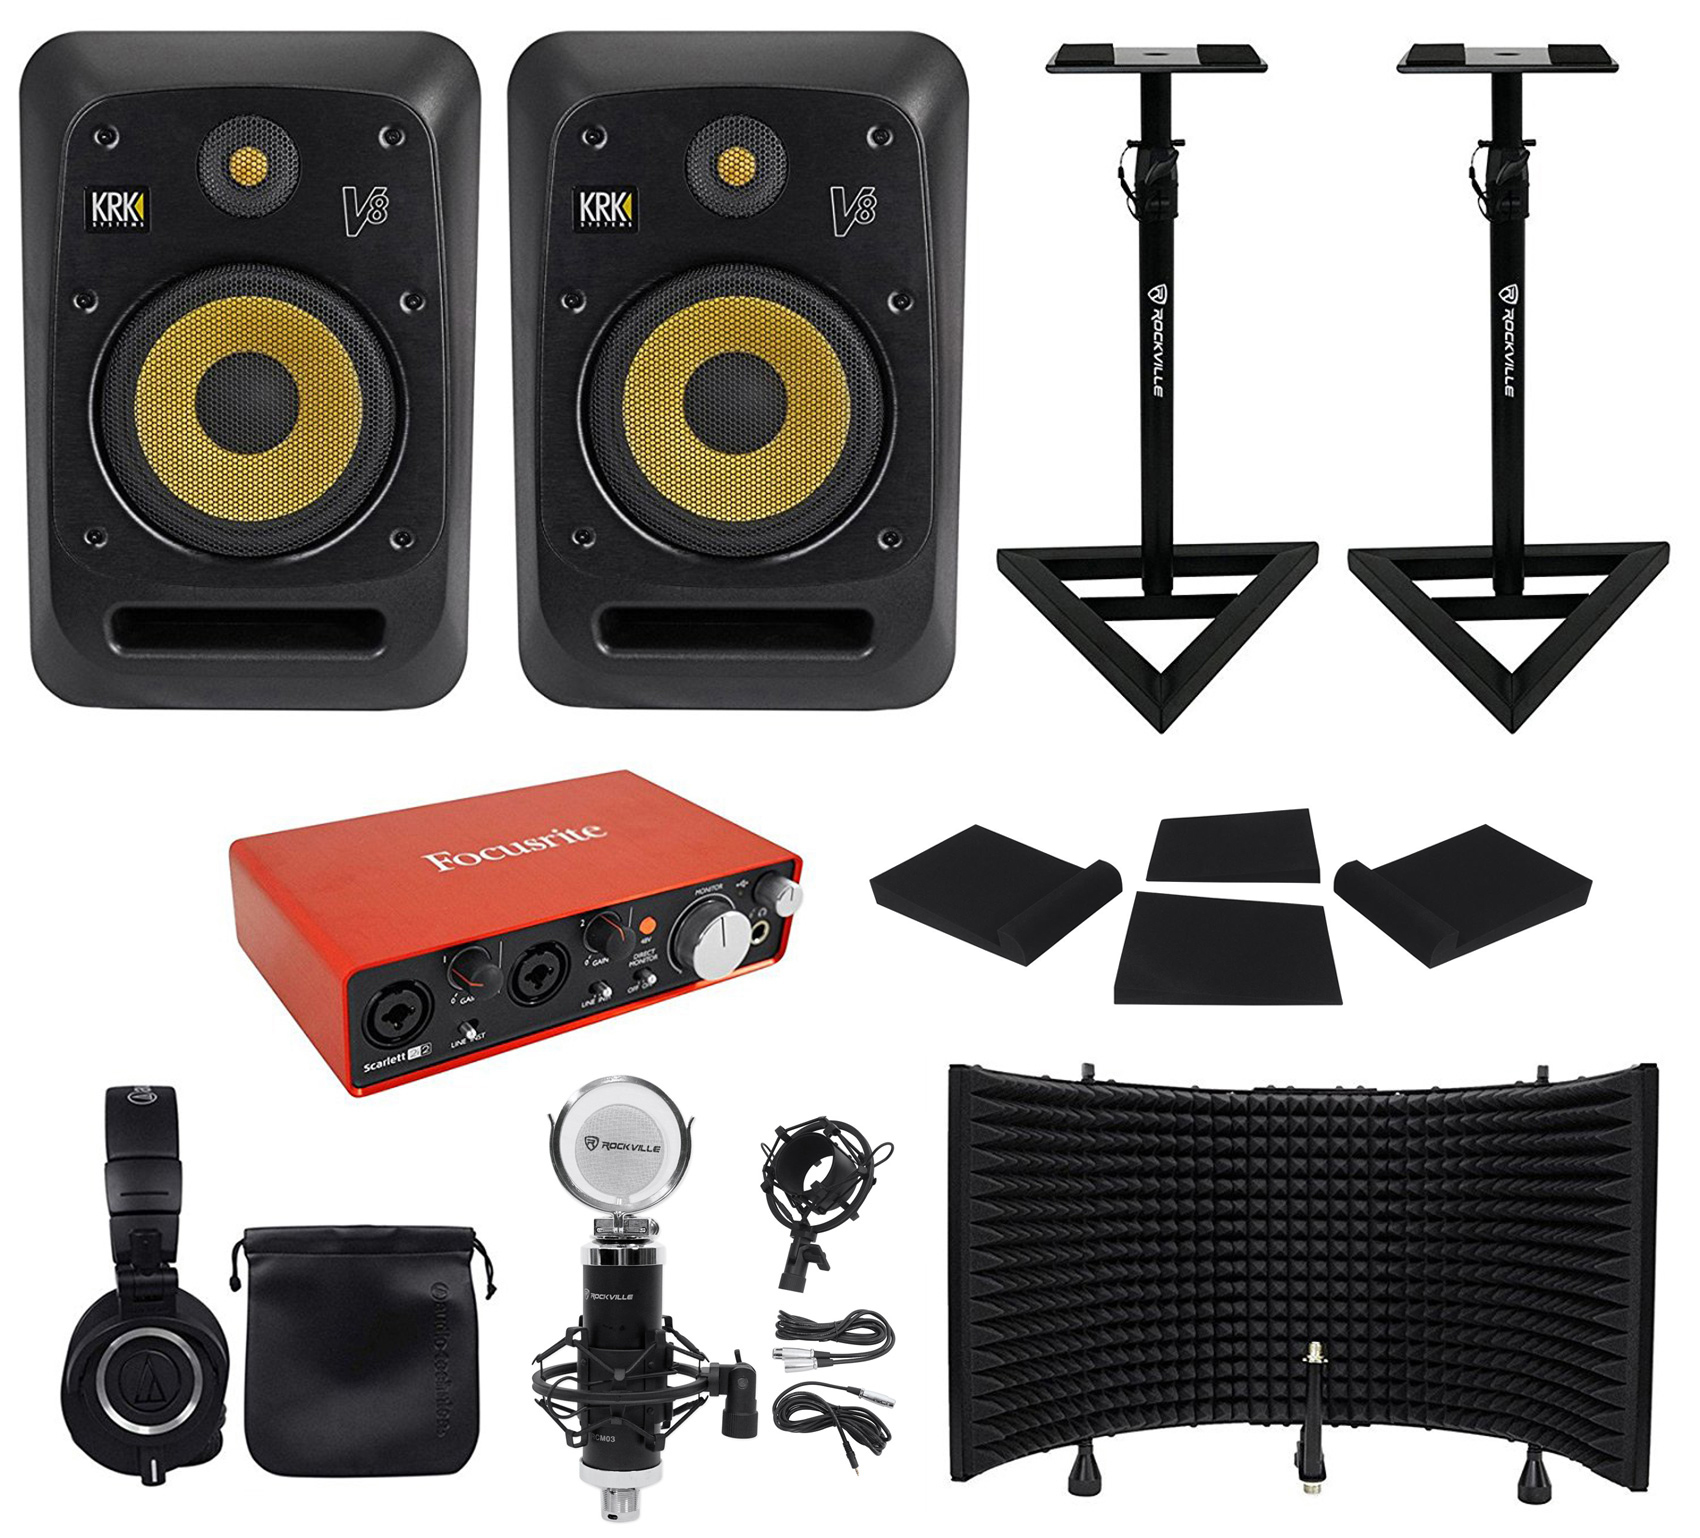 "(2) KRK V8S4-NA 8"" Active Studio Monitors+Stands+Interface+Mic+Headphones+Shiled by KRK"